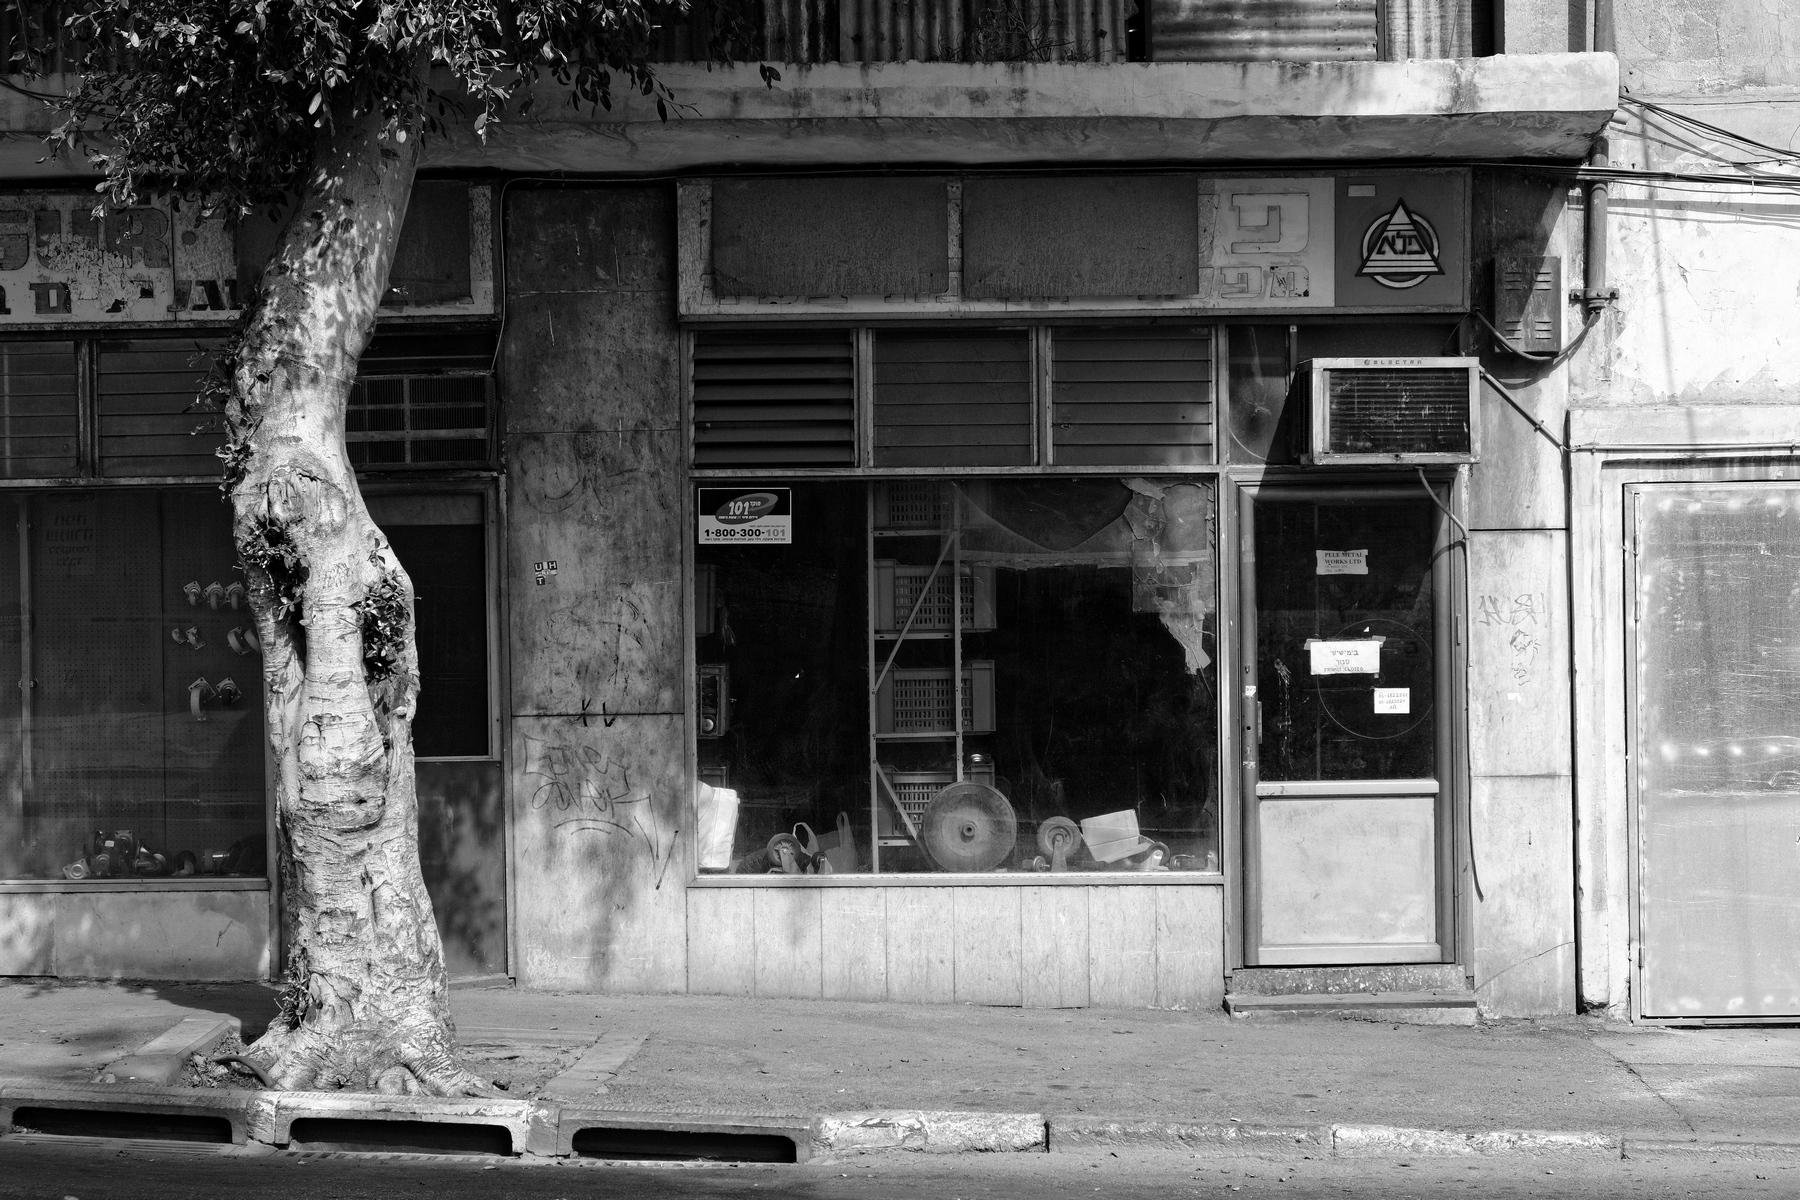 Haim_Blumenblat_Shopping Windows_Abandoned_4.jpg